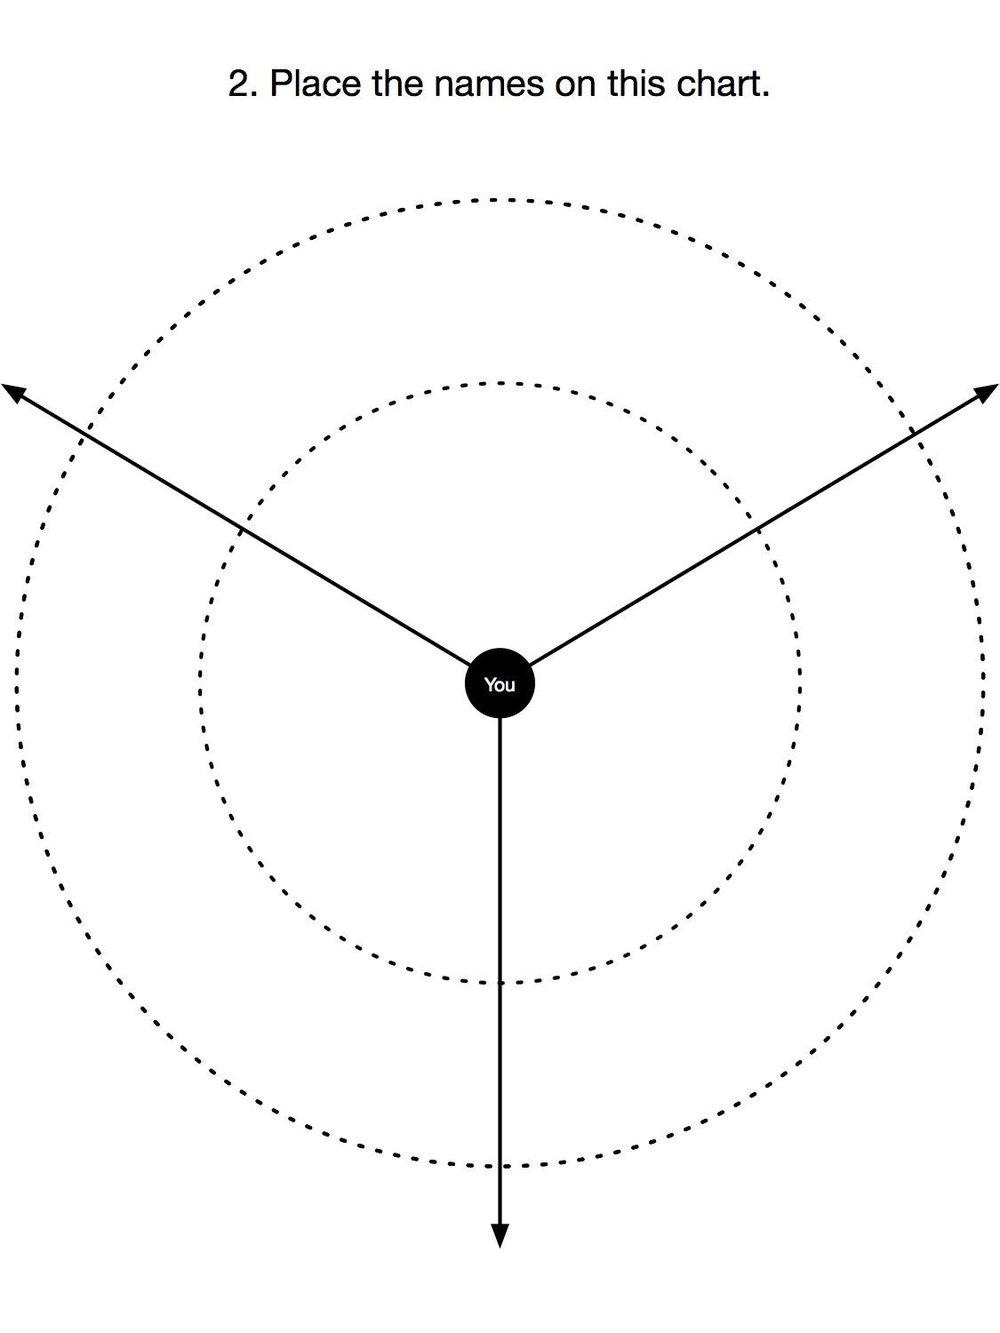 A blank chart